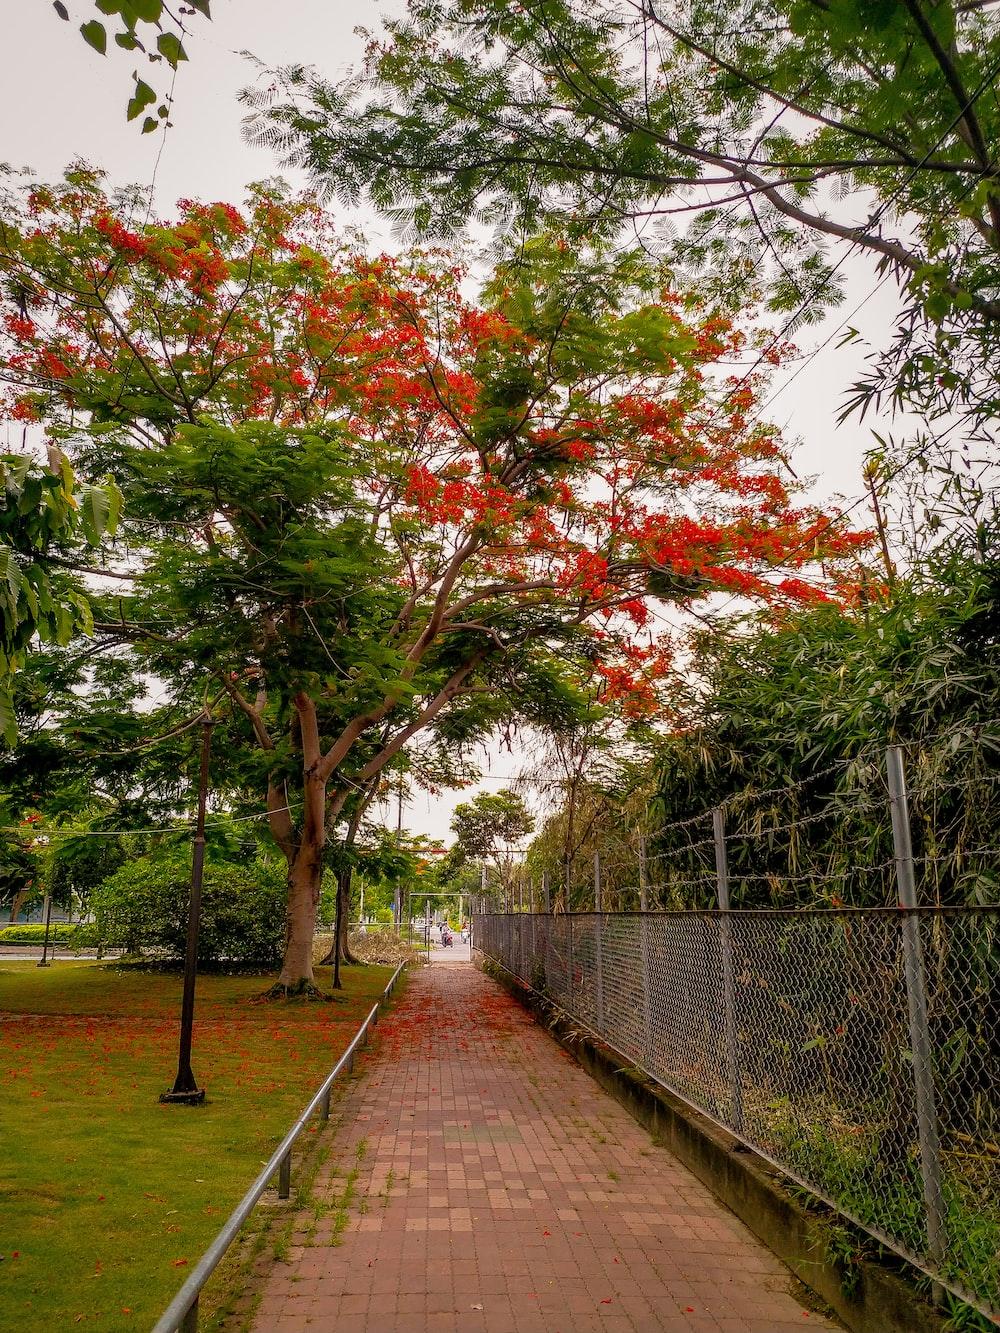 empty pavement under trees